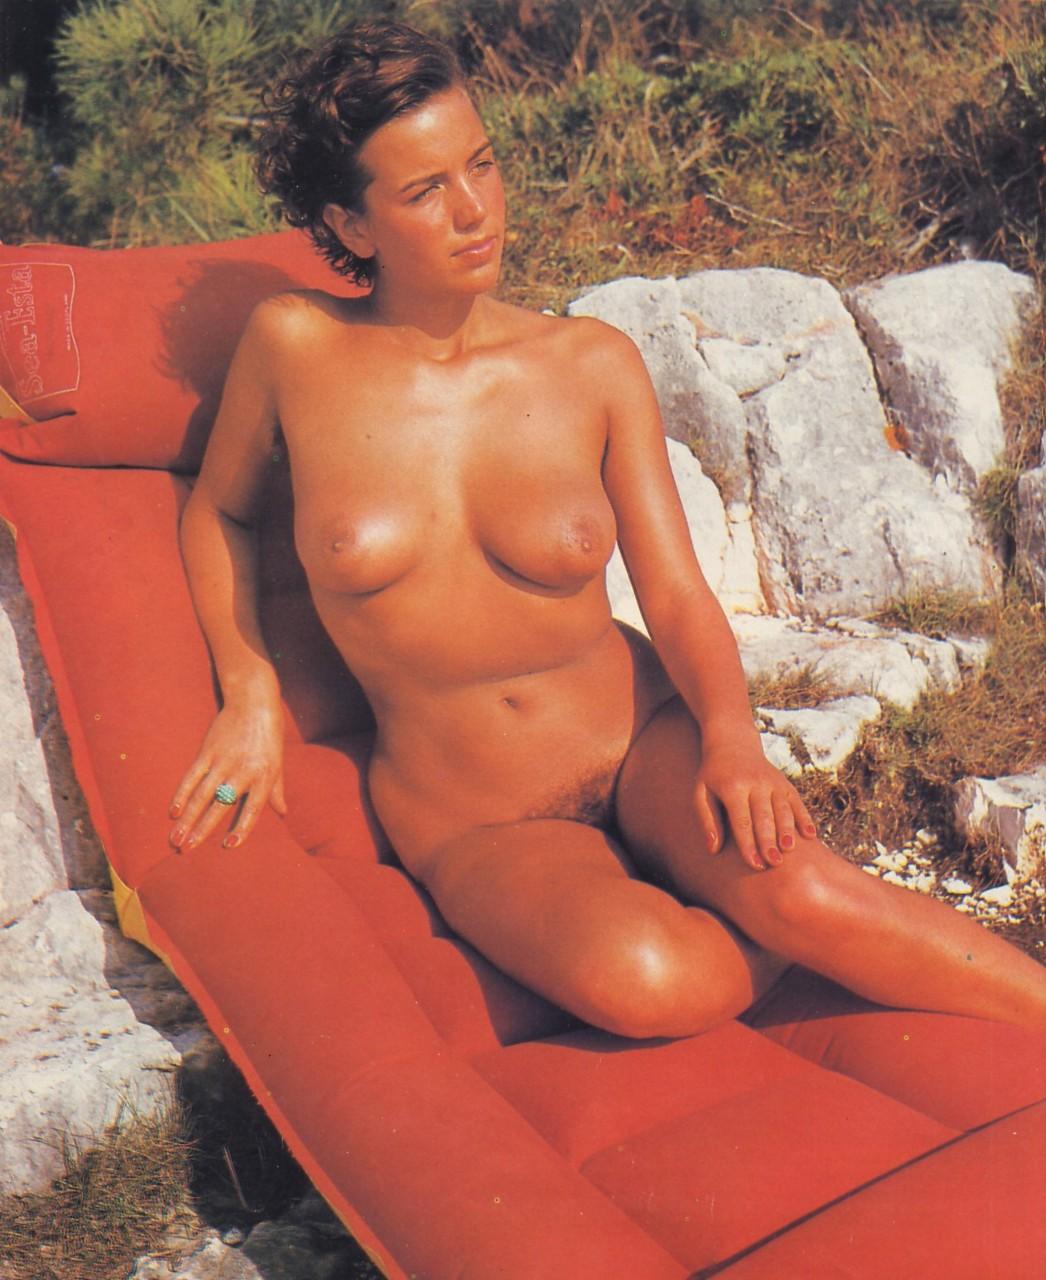 https://www.nudismlife.com/galleries/nudists_and_nude/the_most_natural_nudists/the_most_natural_nudists_0481.jpg